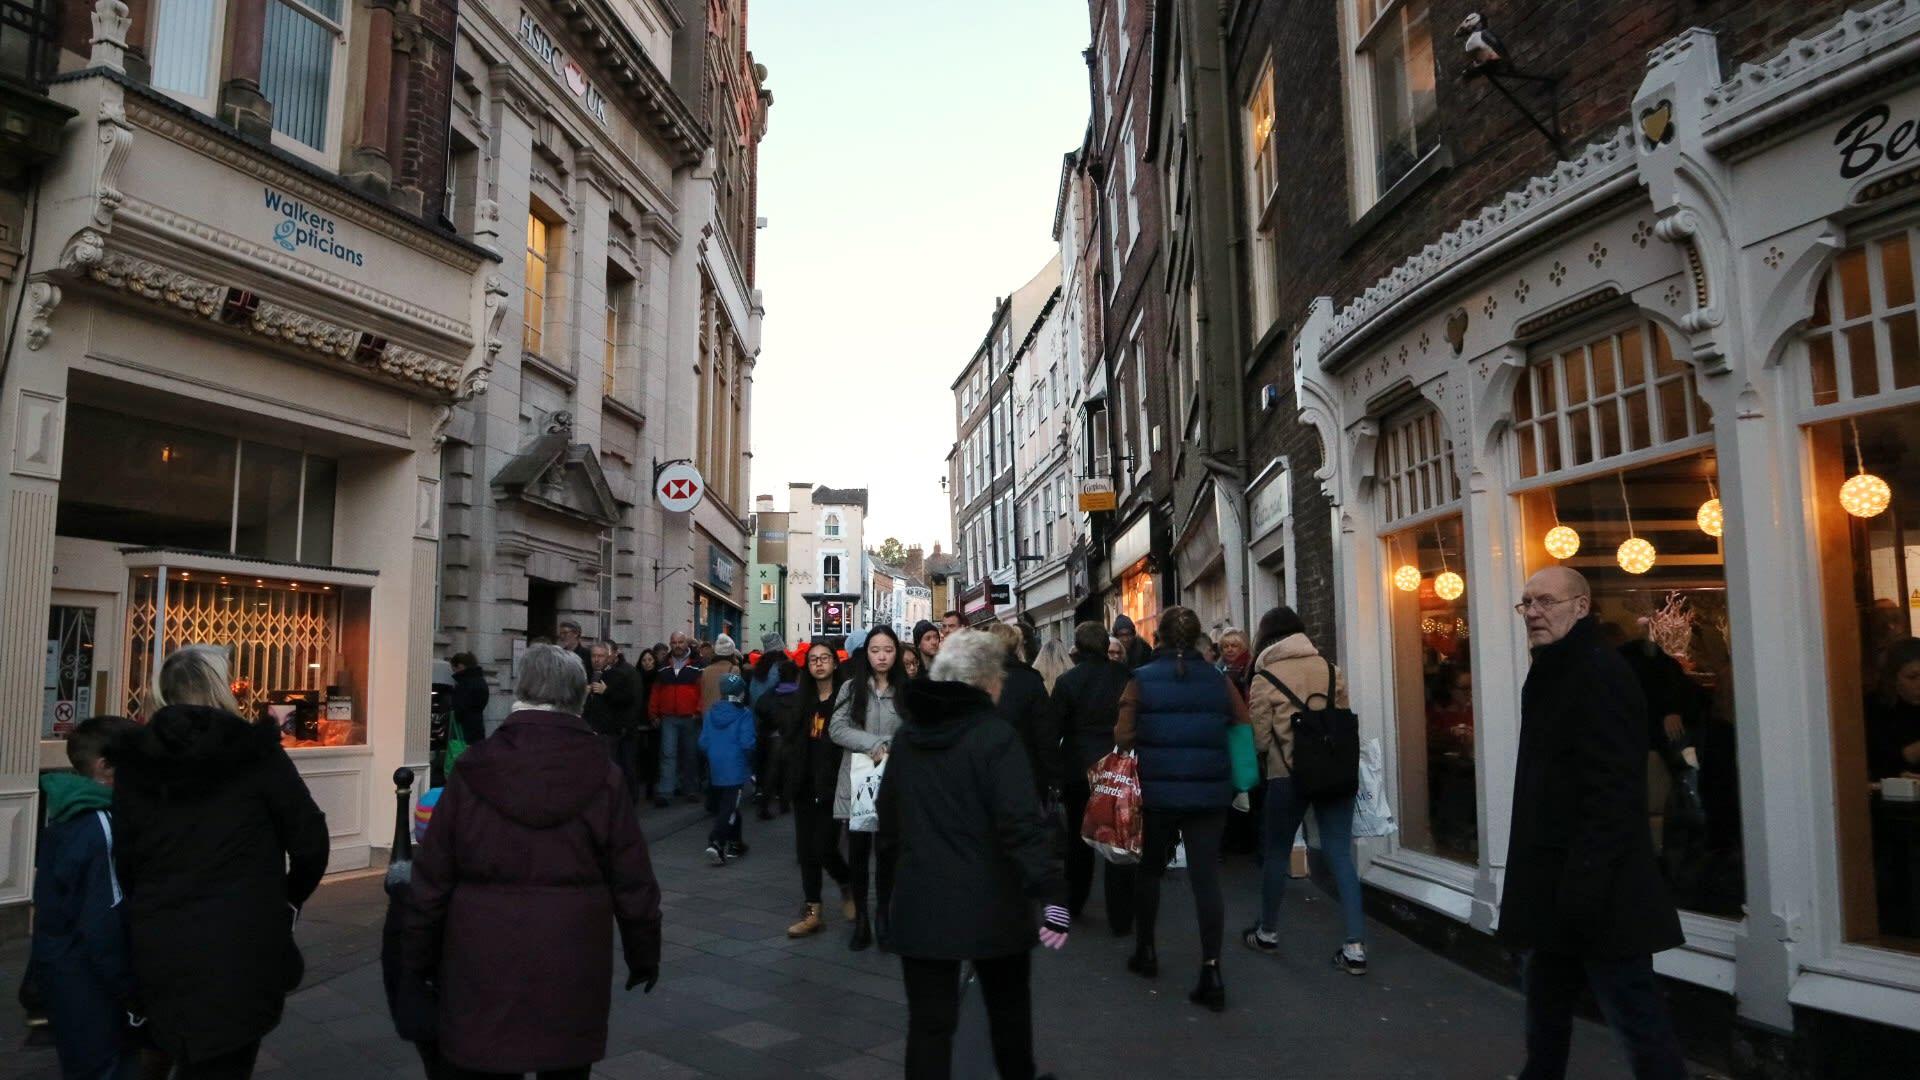 Lumiere是近年備受矚目的燈節活動,杜倫Durham最為盛大,倫敦亦有舉行,自1月18日開始,為期4天。